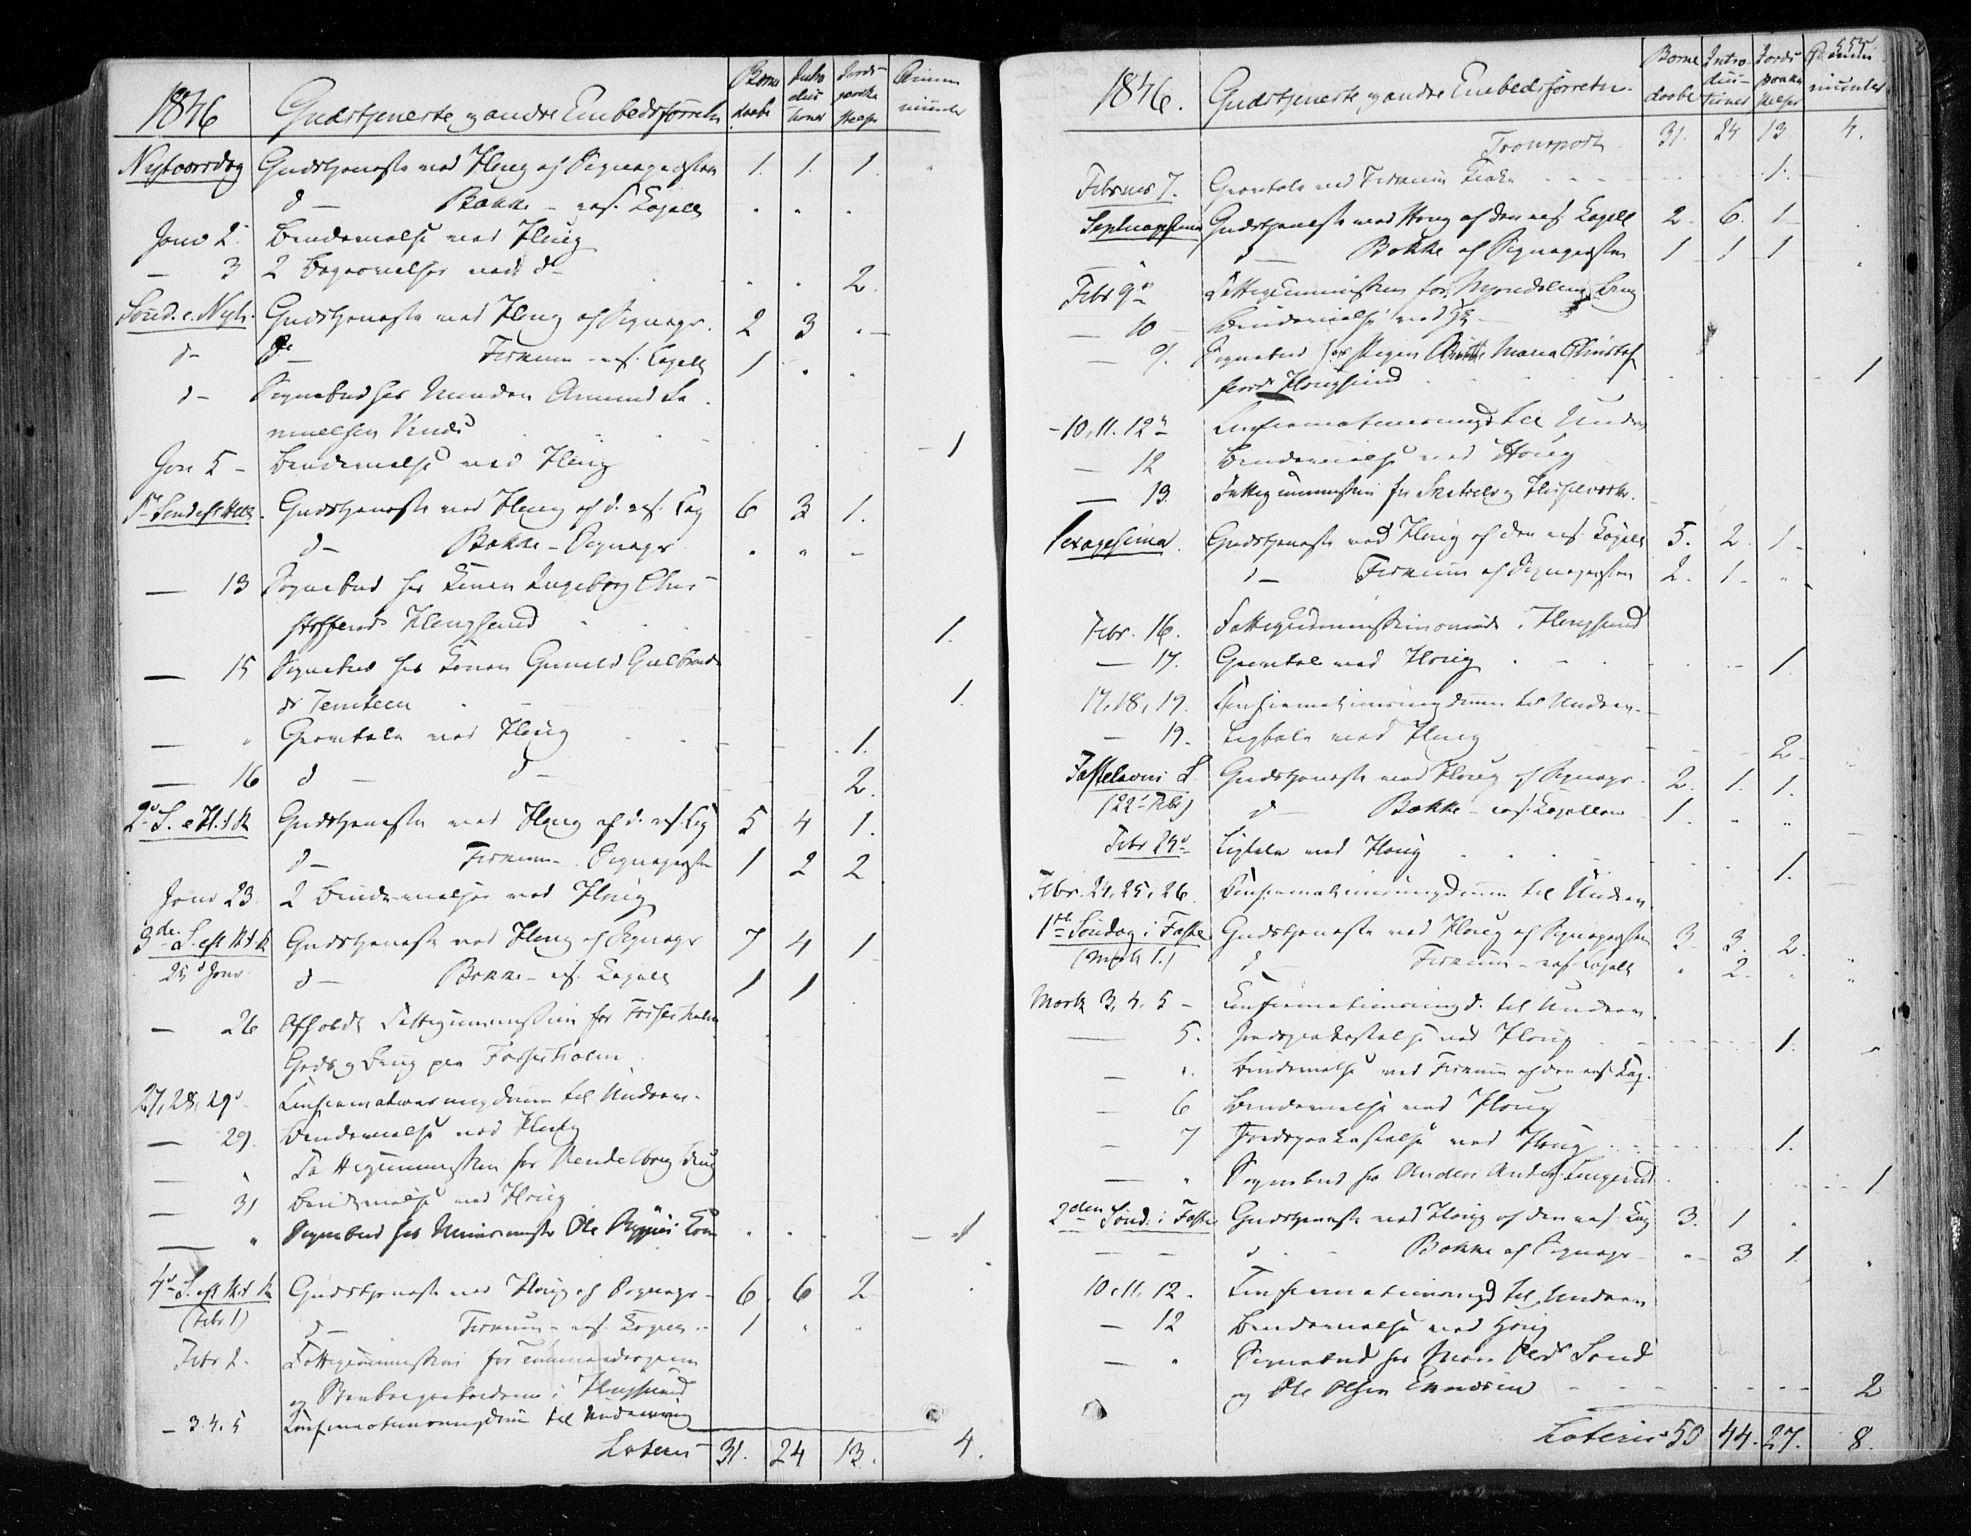 SAKO, Eiker kirkebøker, F/Fa/L0014: Ministerialbok nr. I 14, 1846-1854, s. 554